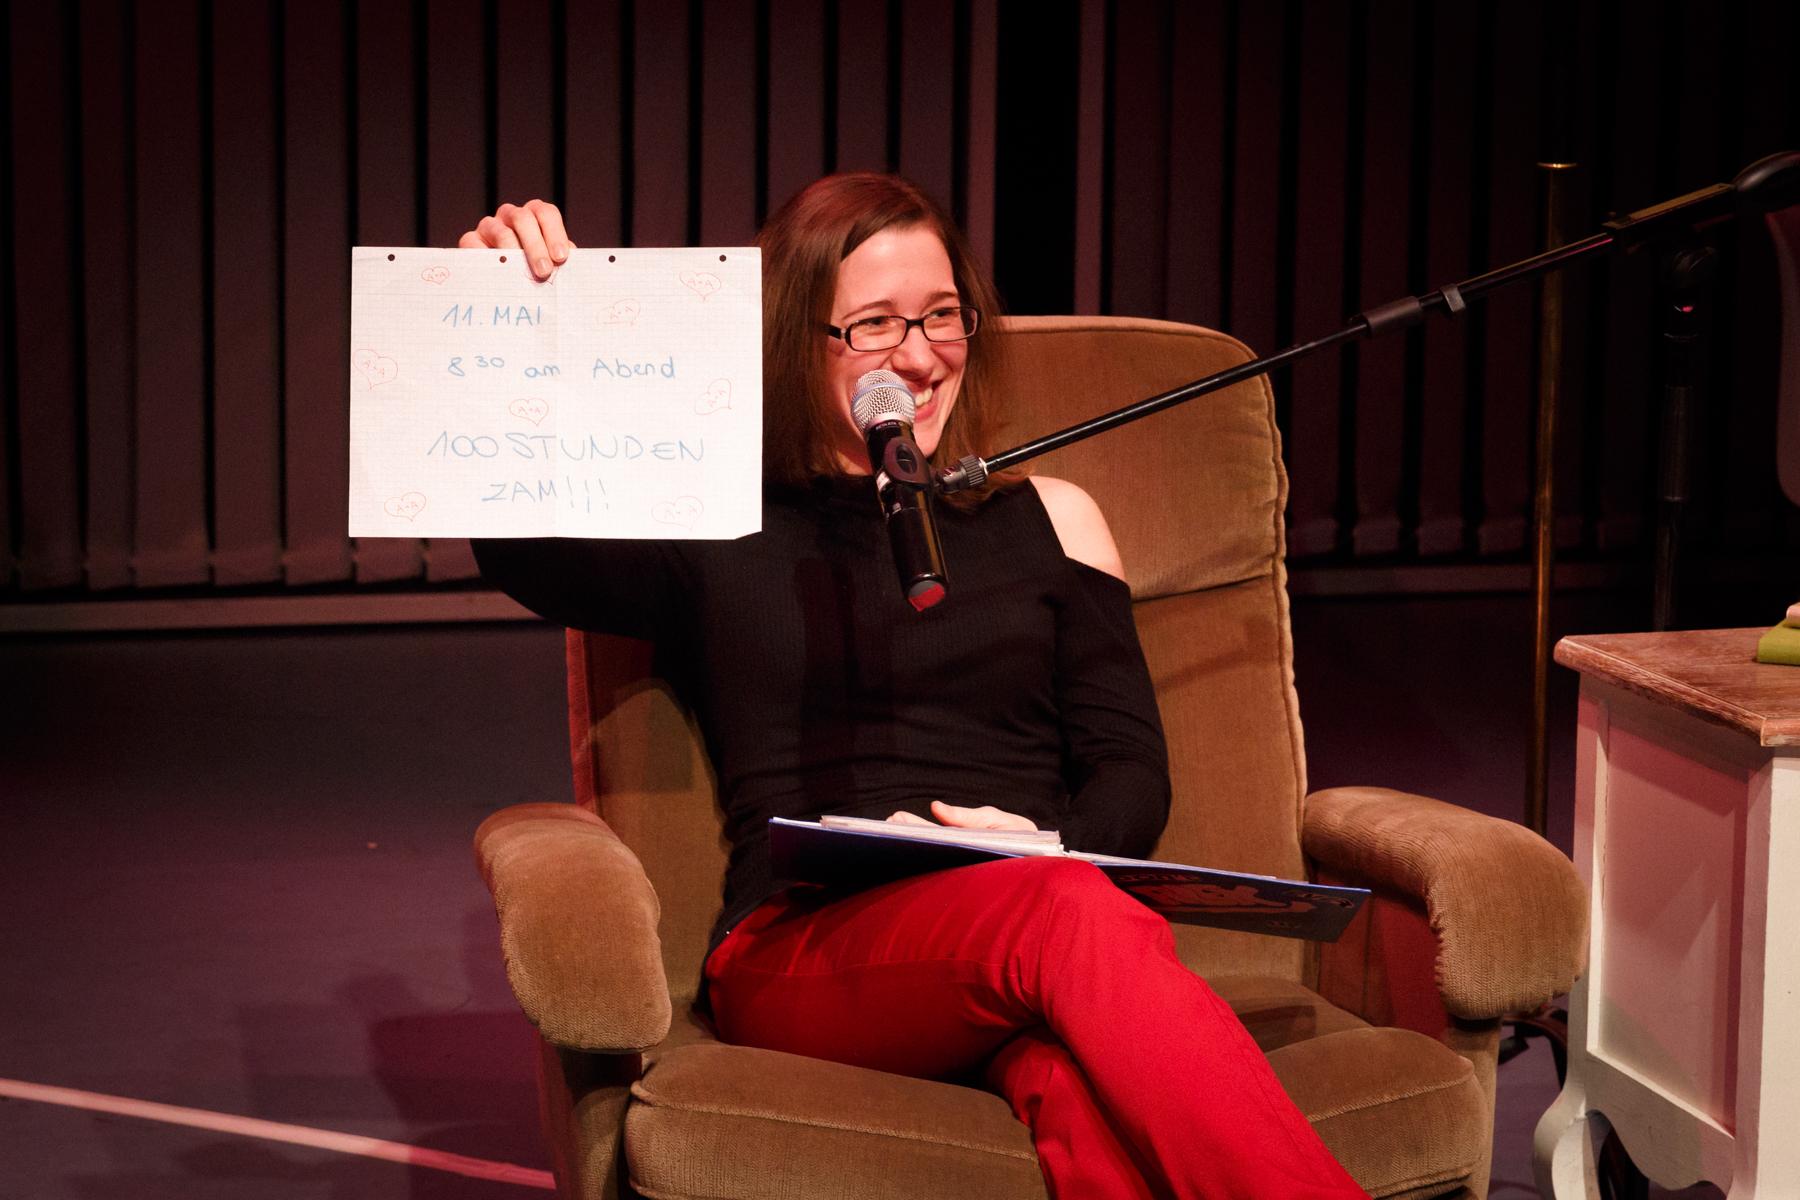 17-11-26 TAGebuch Slam Buchpräsentation_©anna konrath_27.jpg